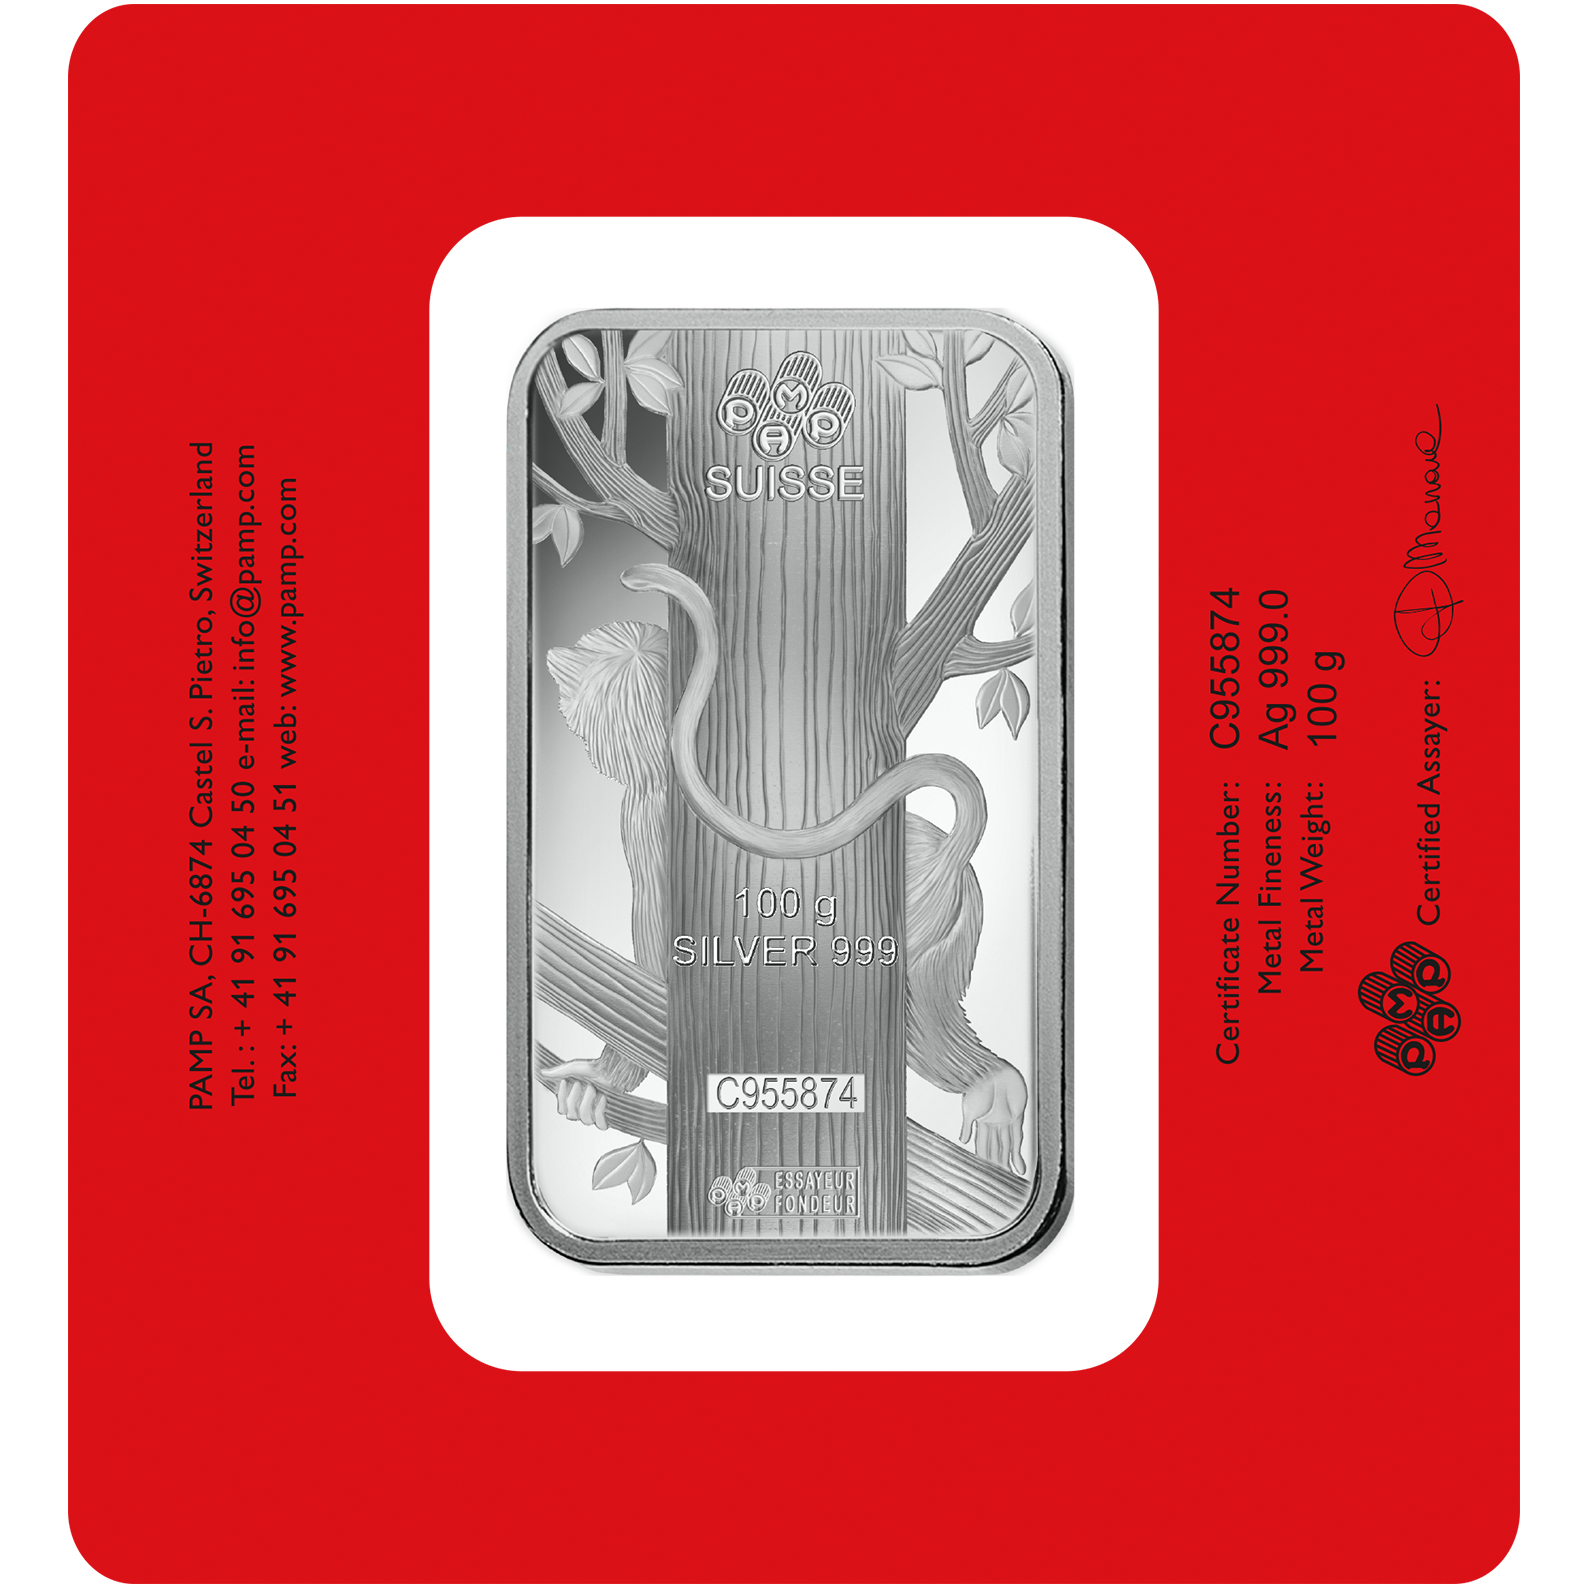 100 grammi lingottino d'argento - PAMP Suisse Lunar Scimmia